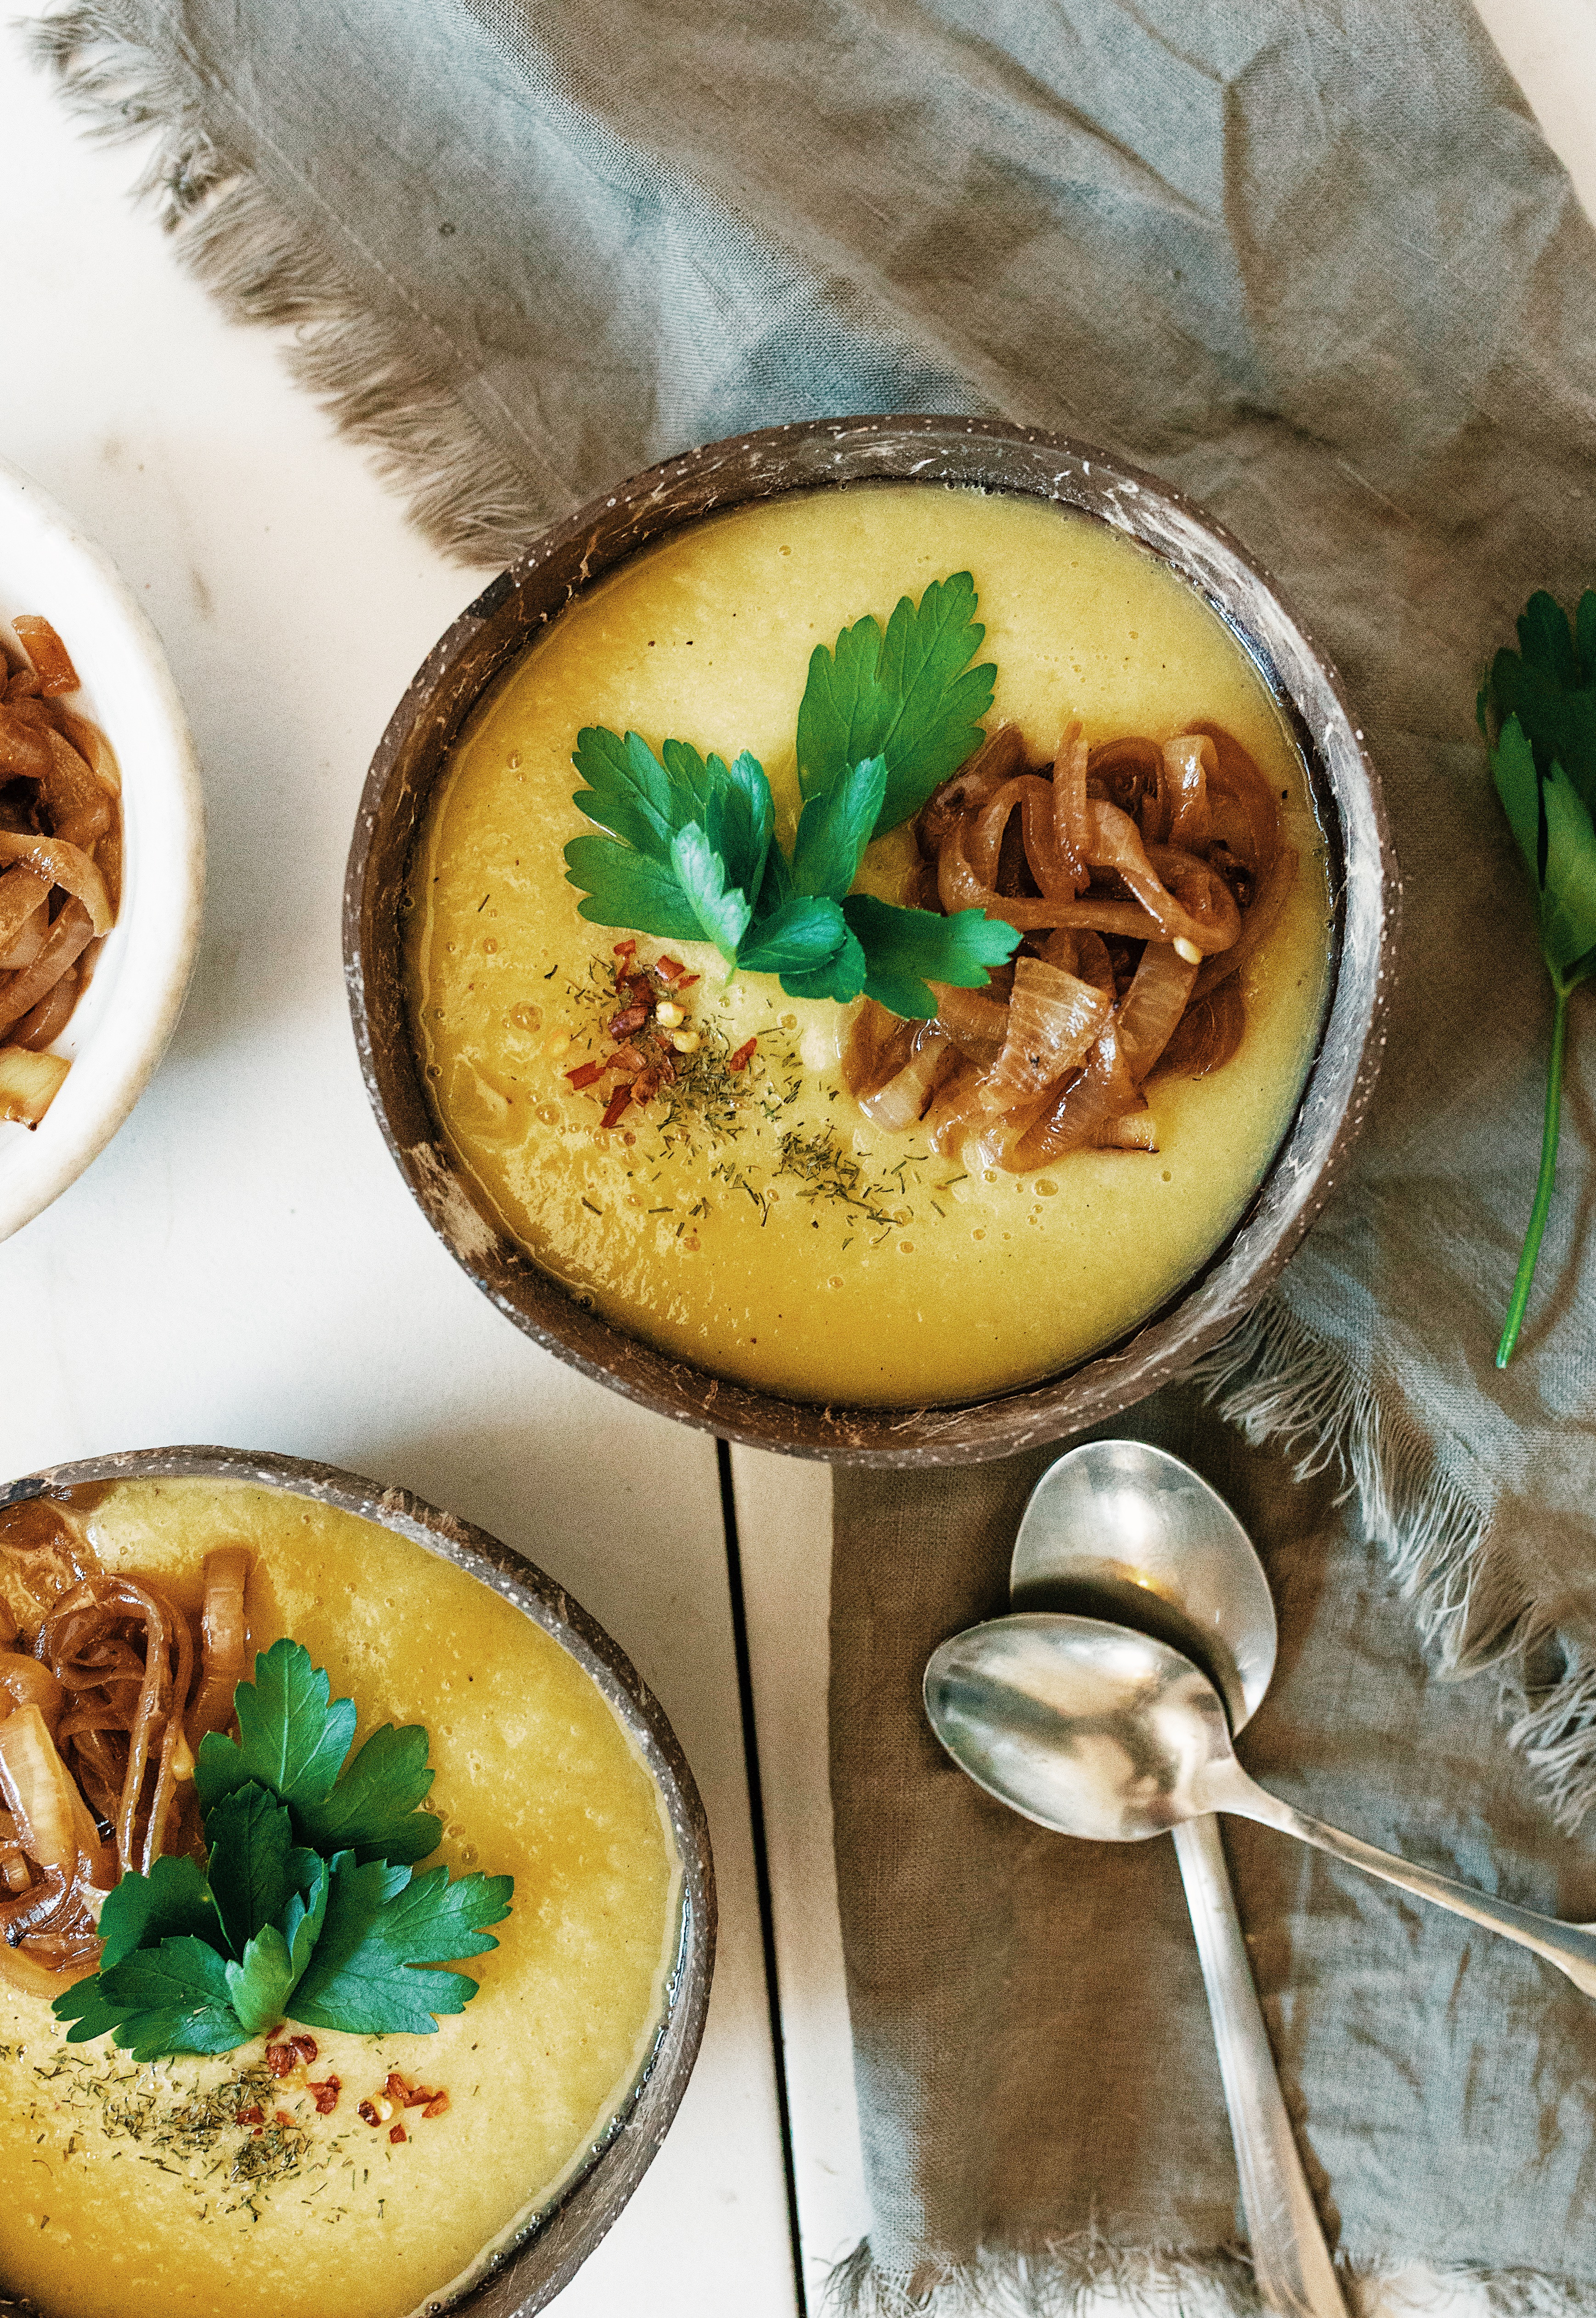 Cauliflower and garlic soup